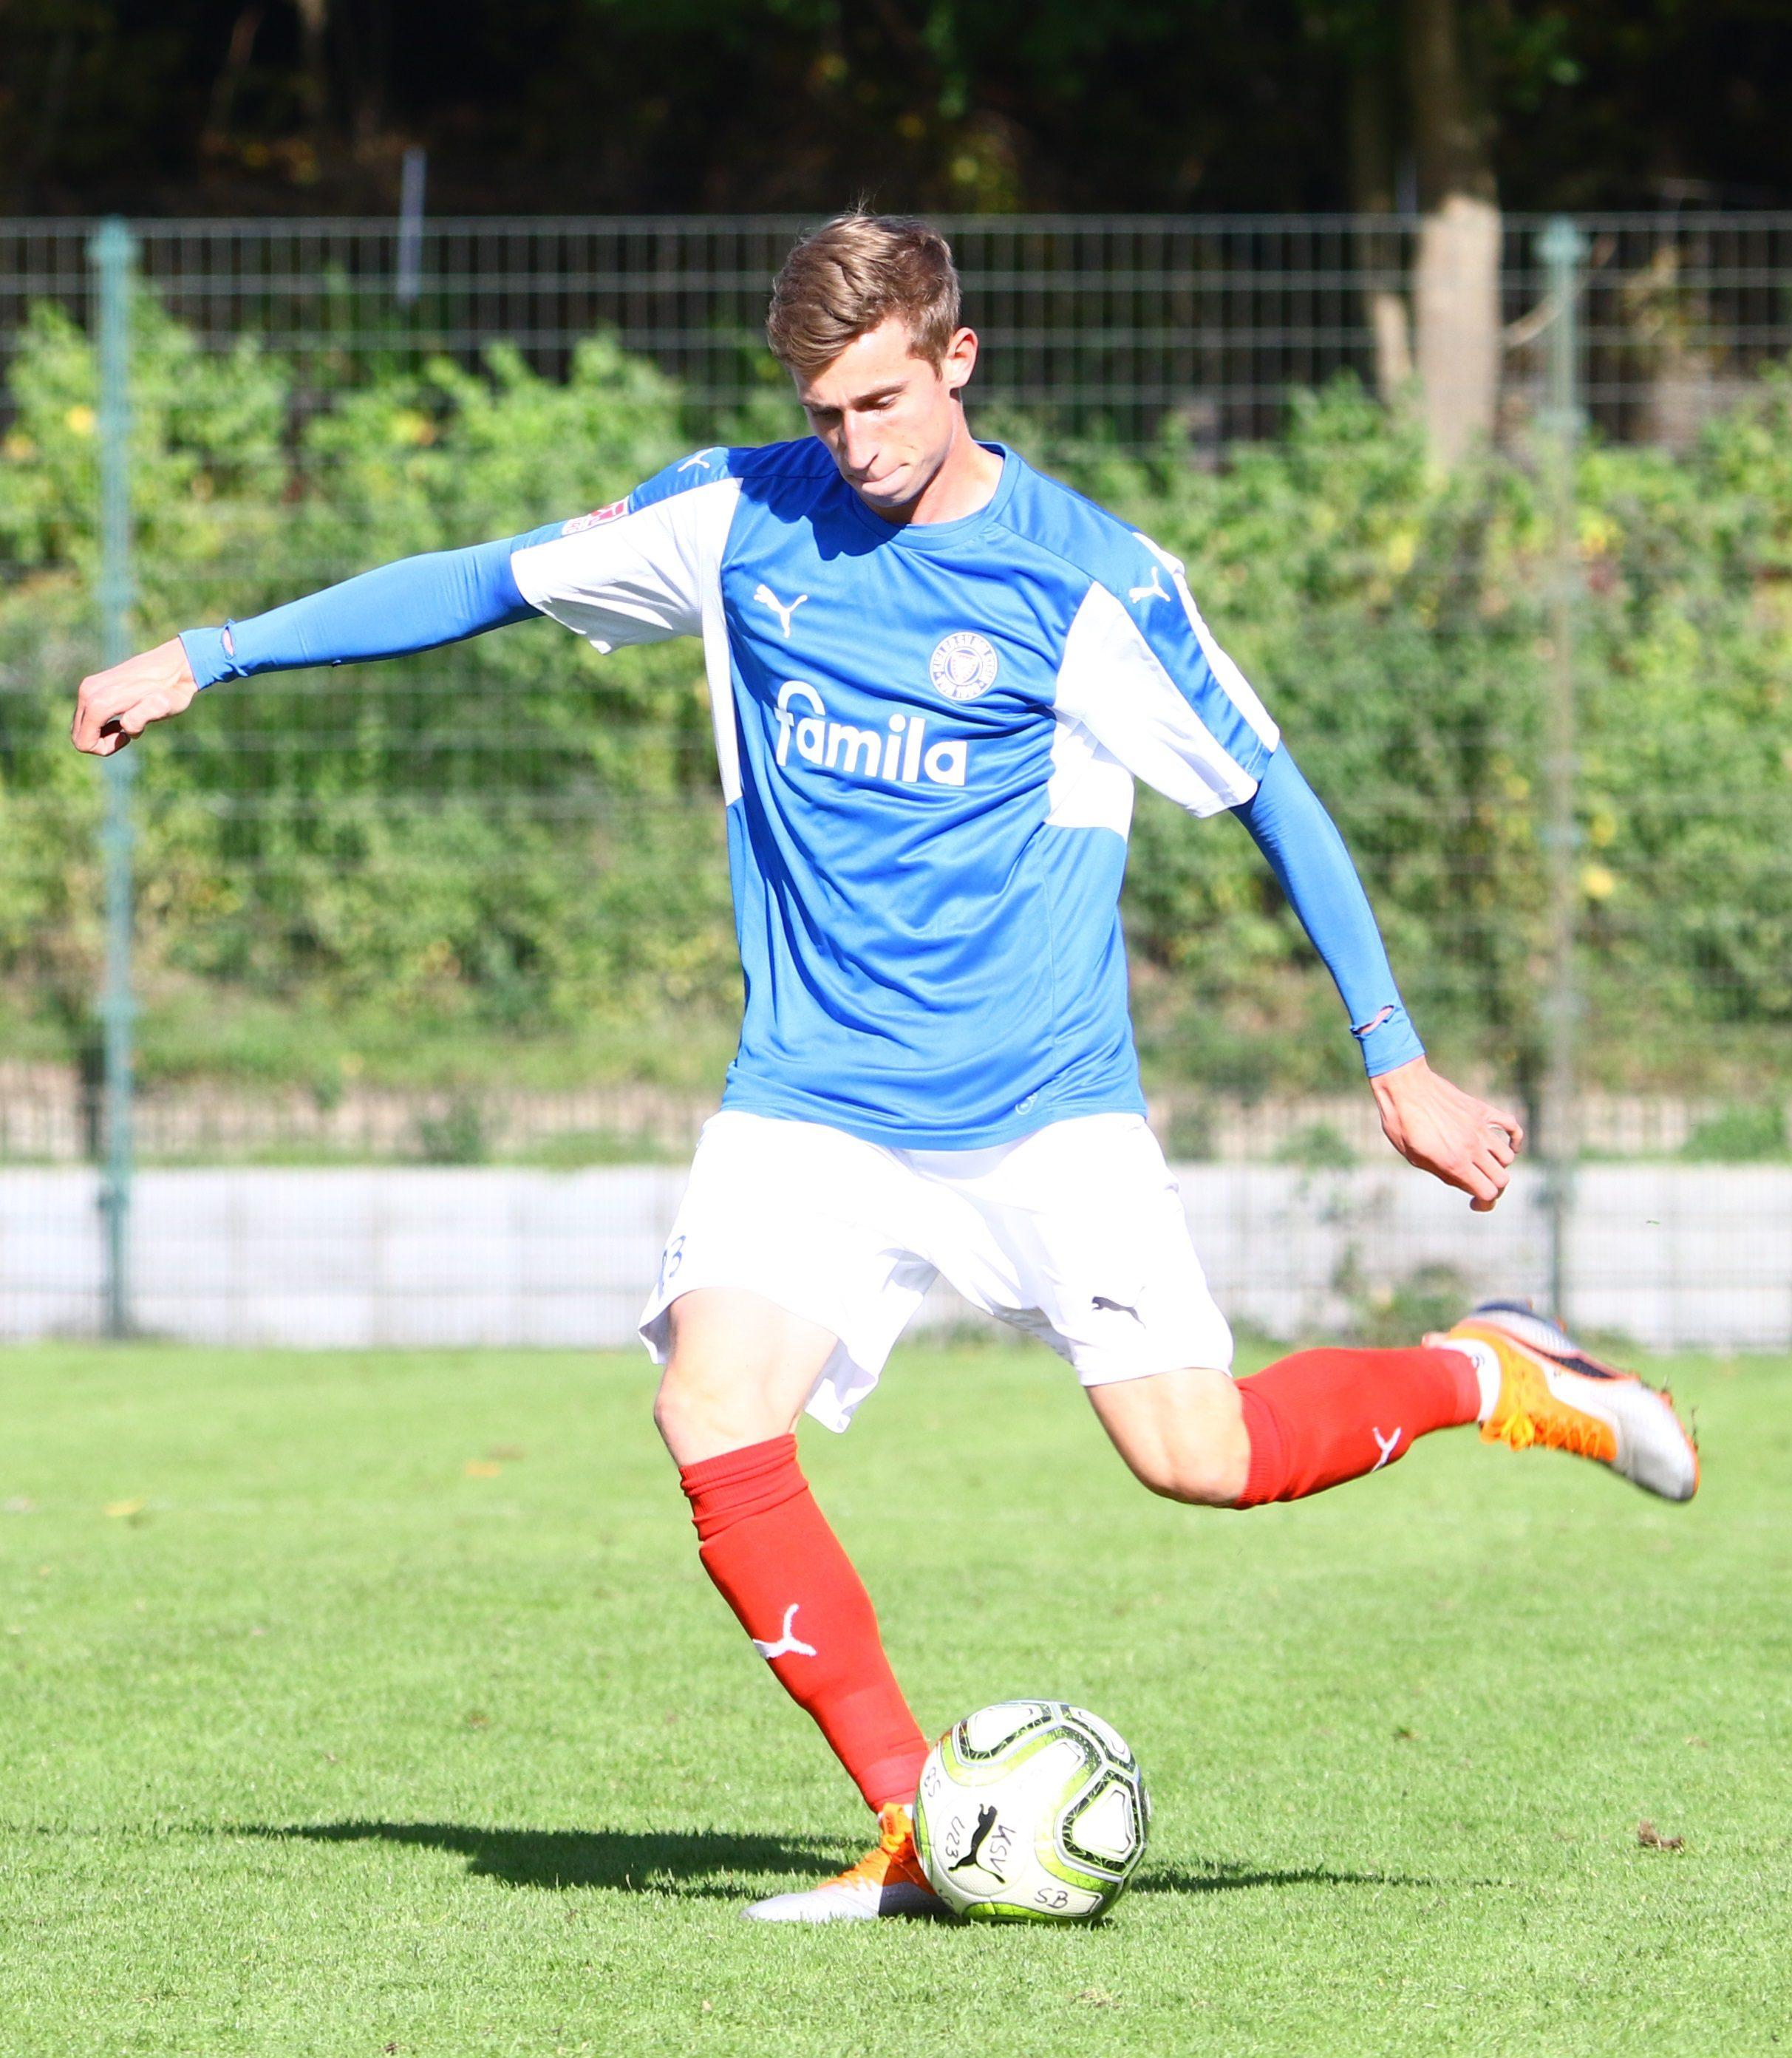 Holstein U23 Fc St Pauli Ii Kieler Sportvereinigung Holstein